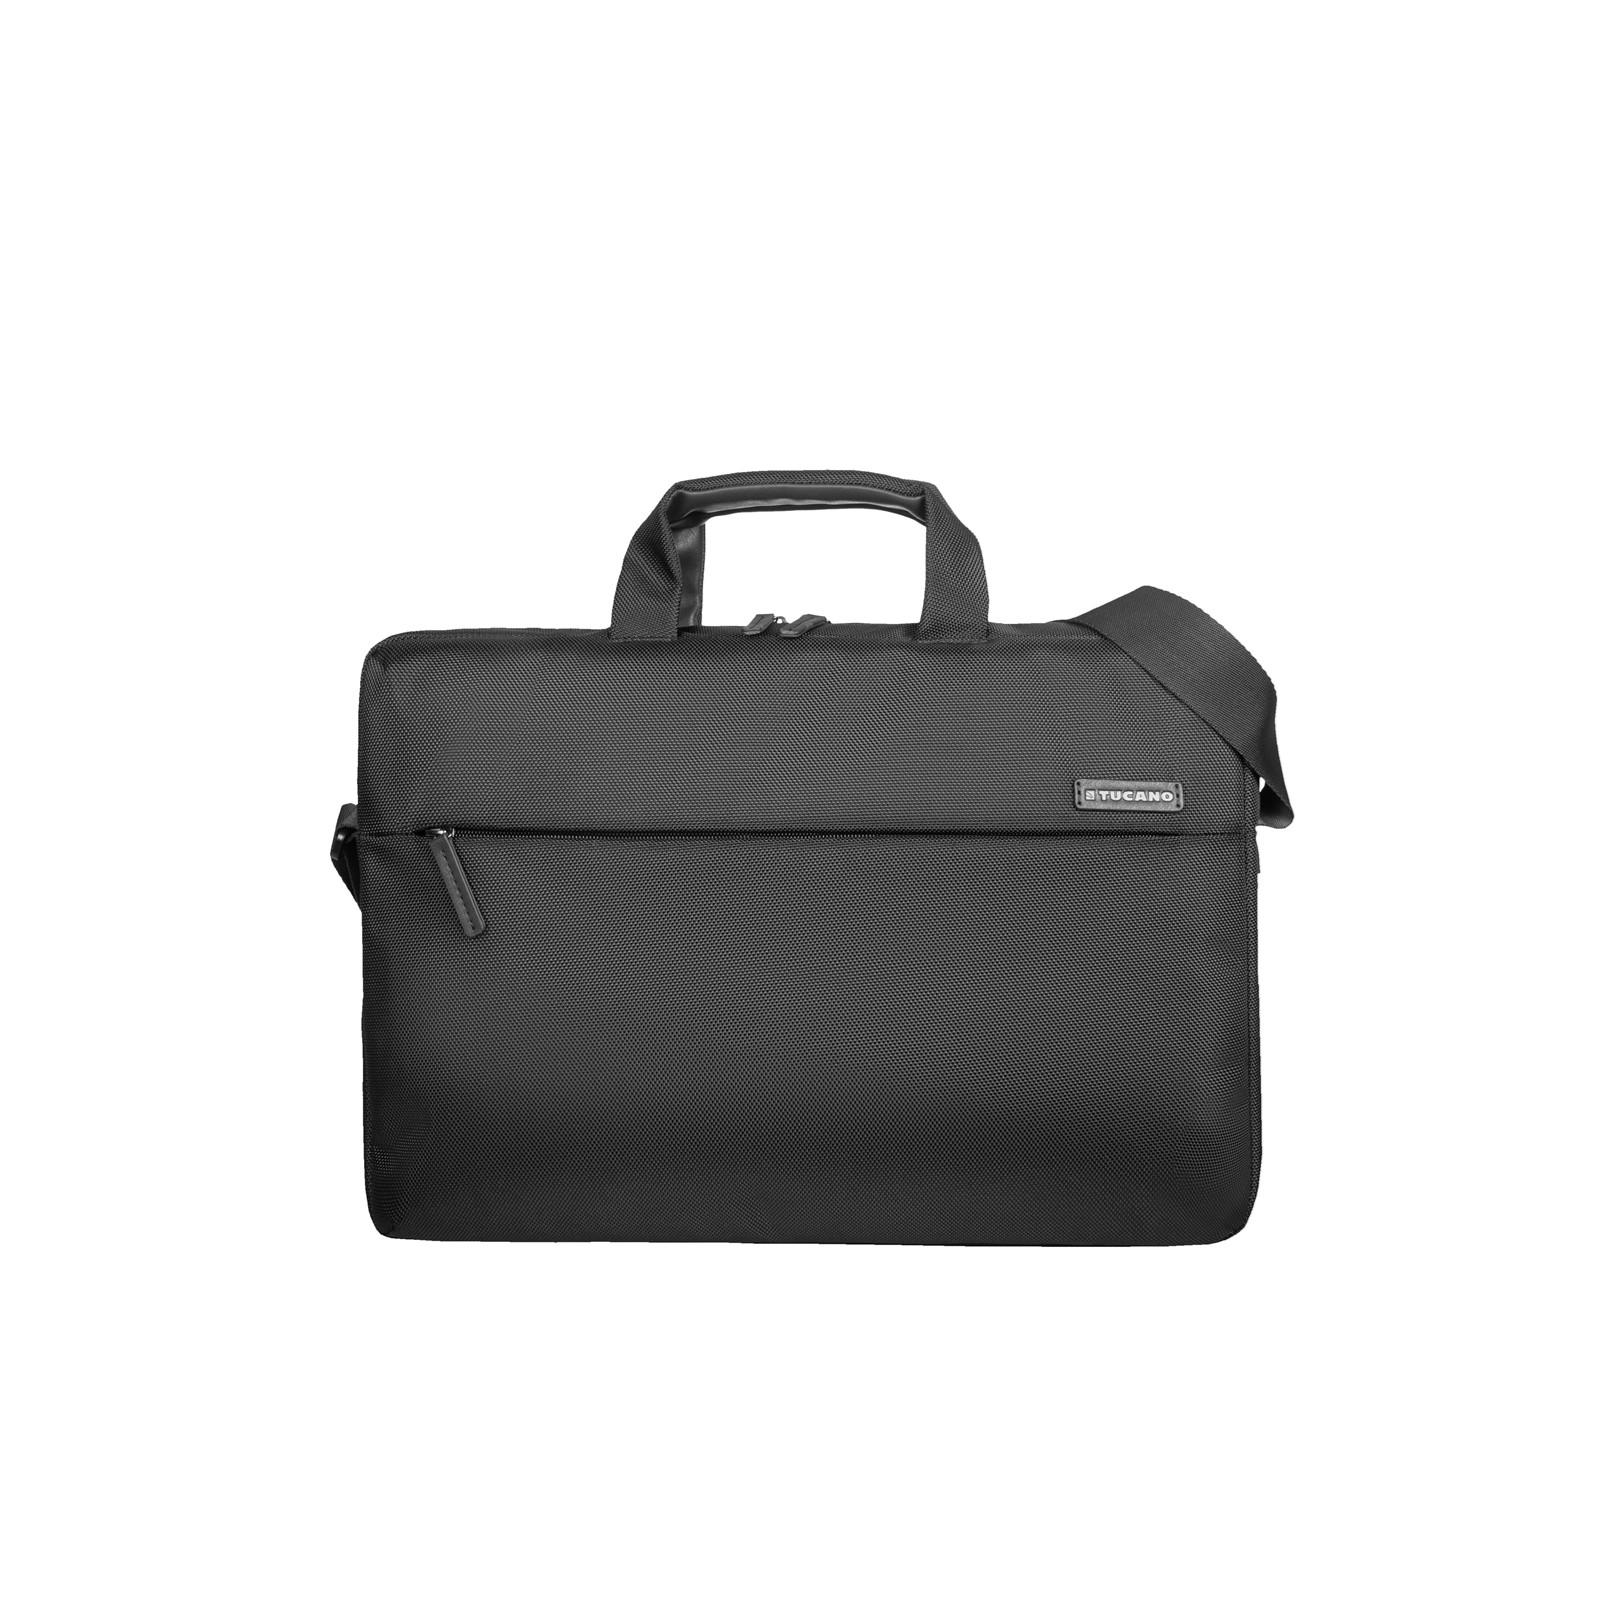 Tucano Free & Busy Business bag 14'' laptop/15'' MacBook Pro, Black